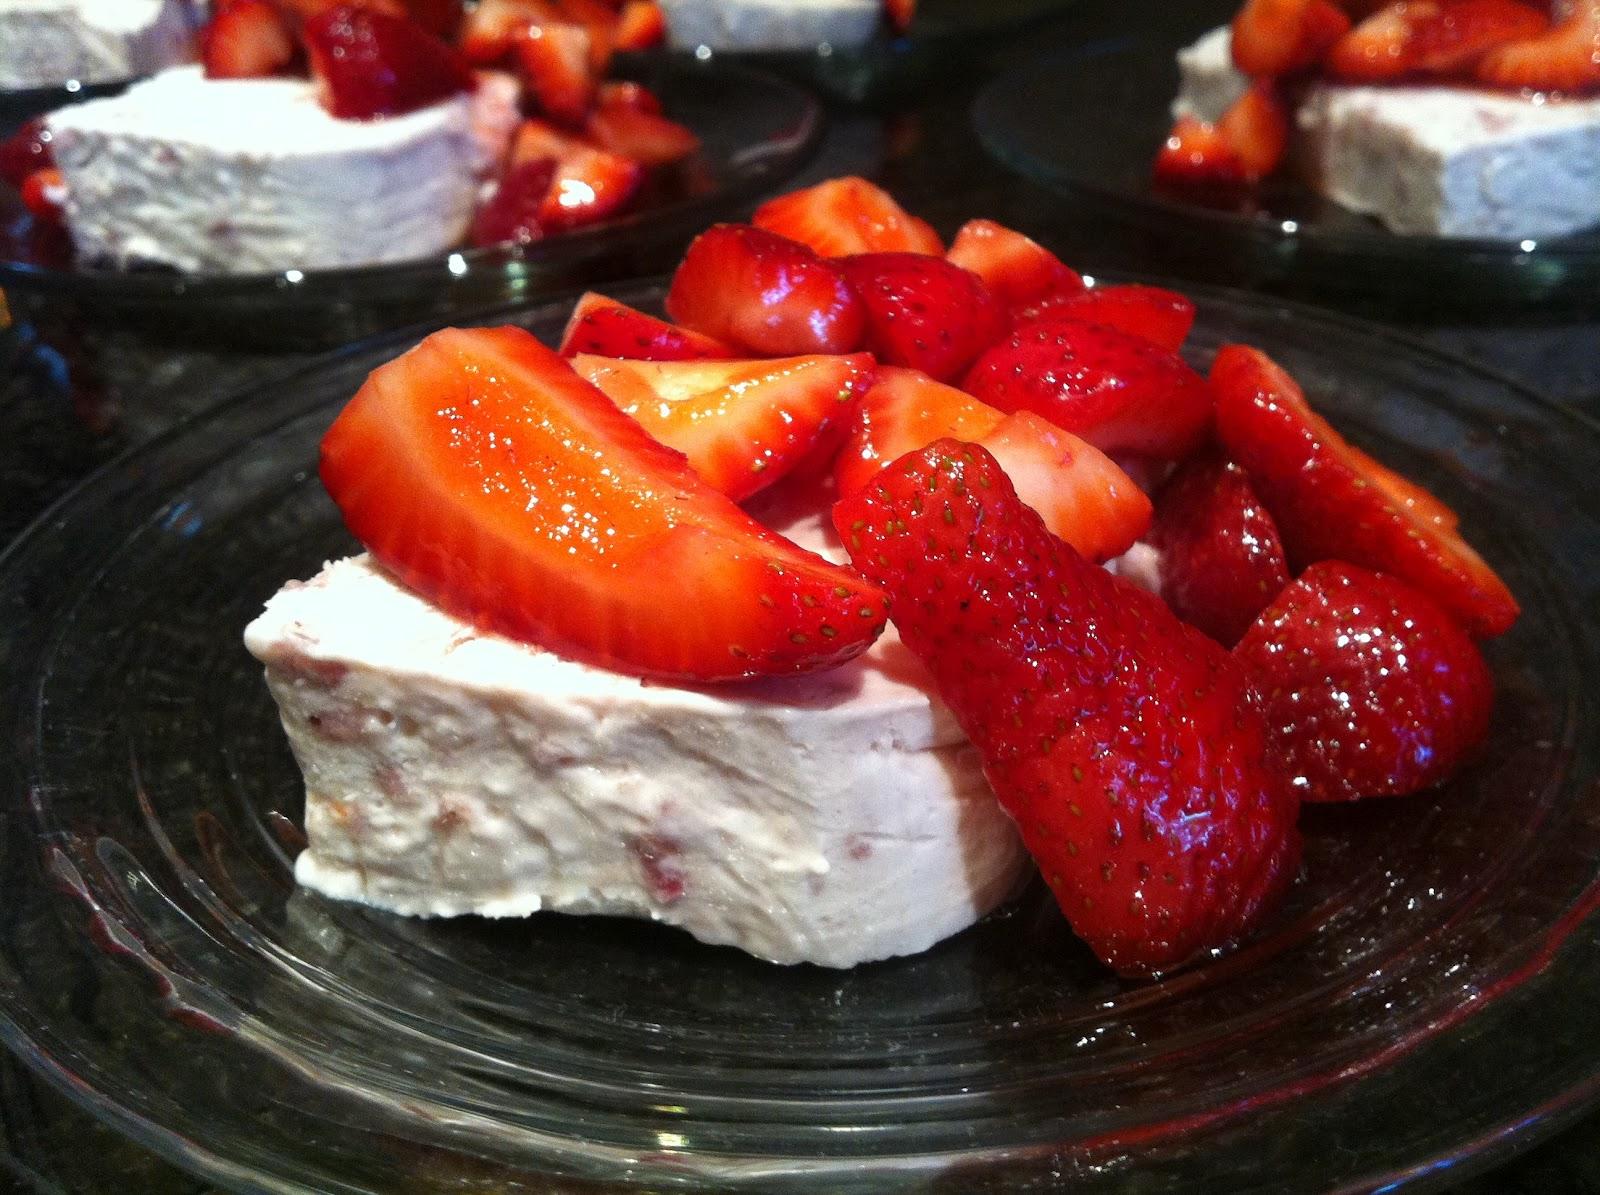 For the Love of Food: Strawberry and Cream Semifreddo